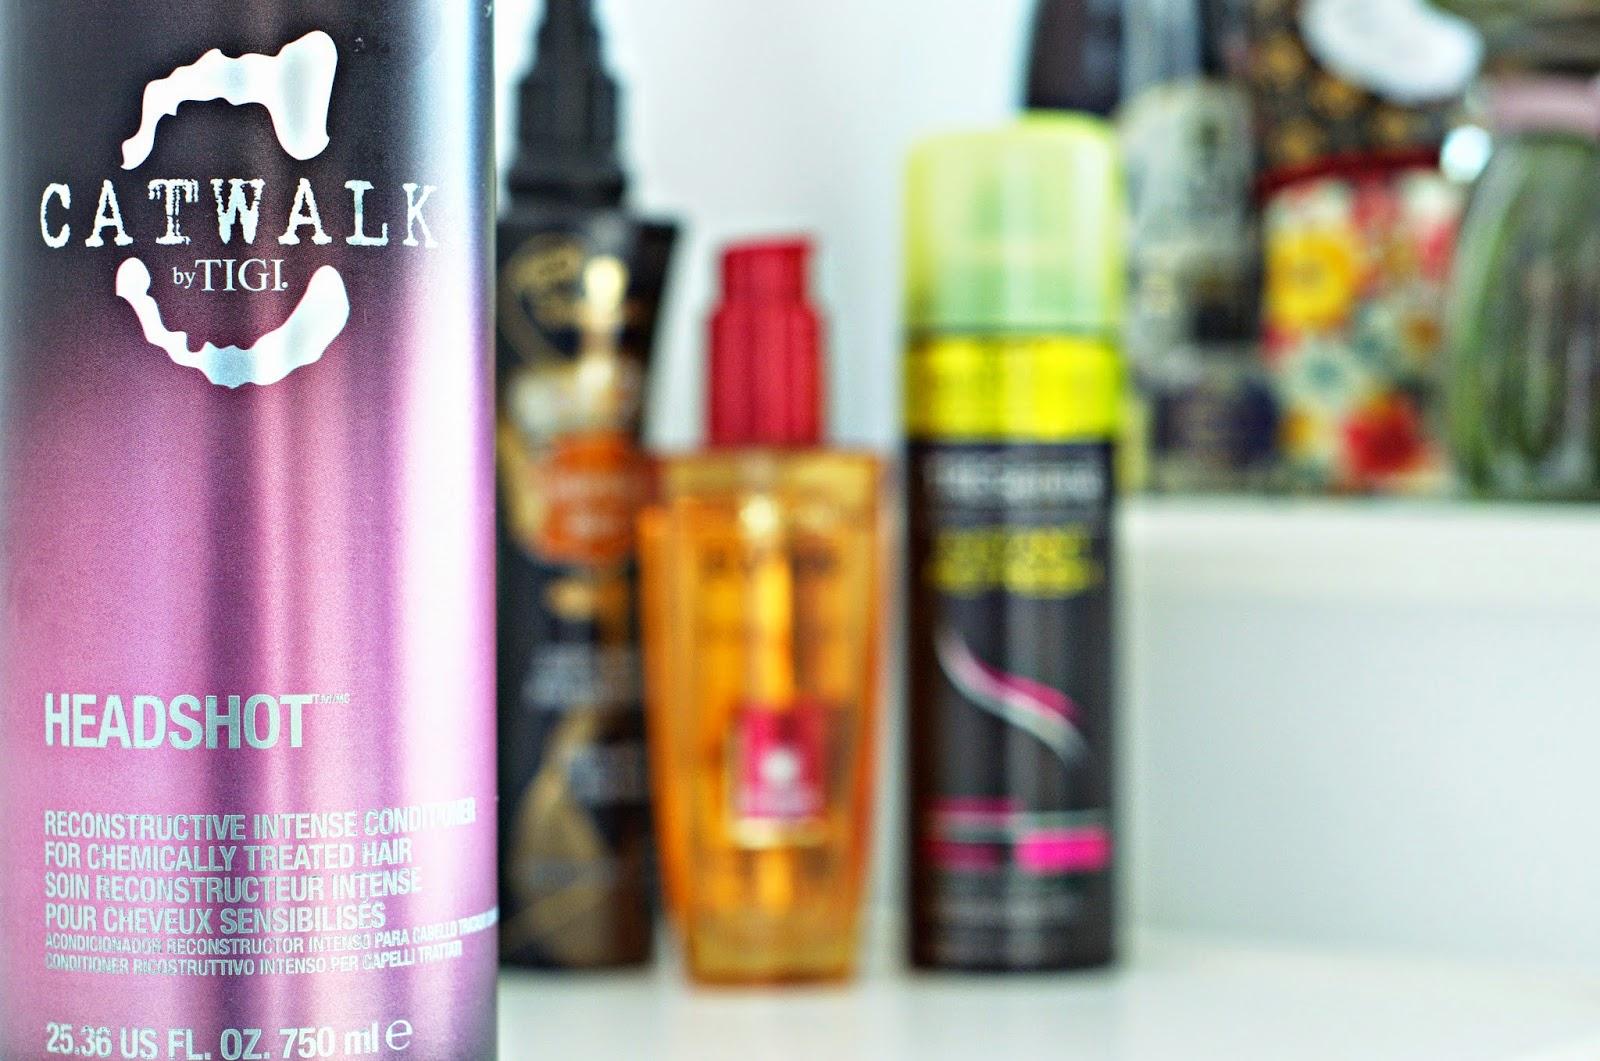 My Hair Care Routine: Catwalk TIGI Headshot